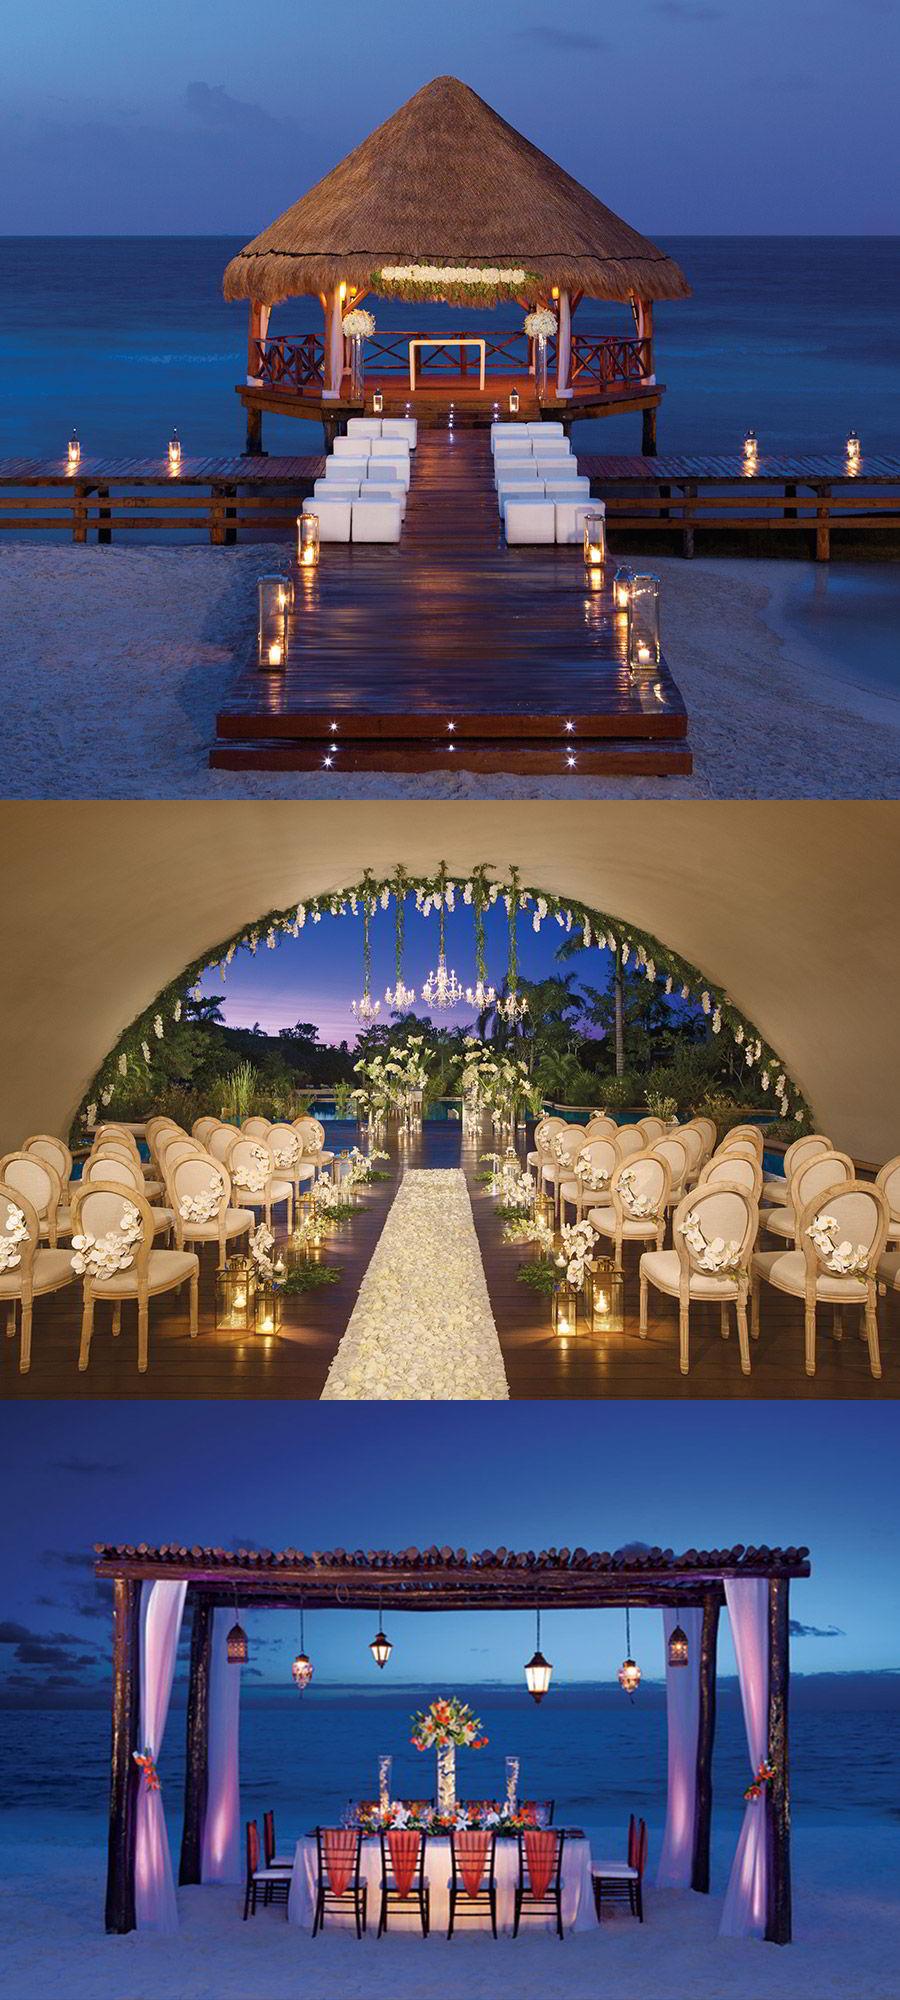 secrets resorts caribbean beach destination wedding luxury honeymoon charming bohemian enchanted wedding venue night gazebo arch silversands akumal capri